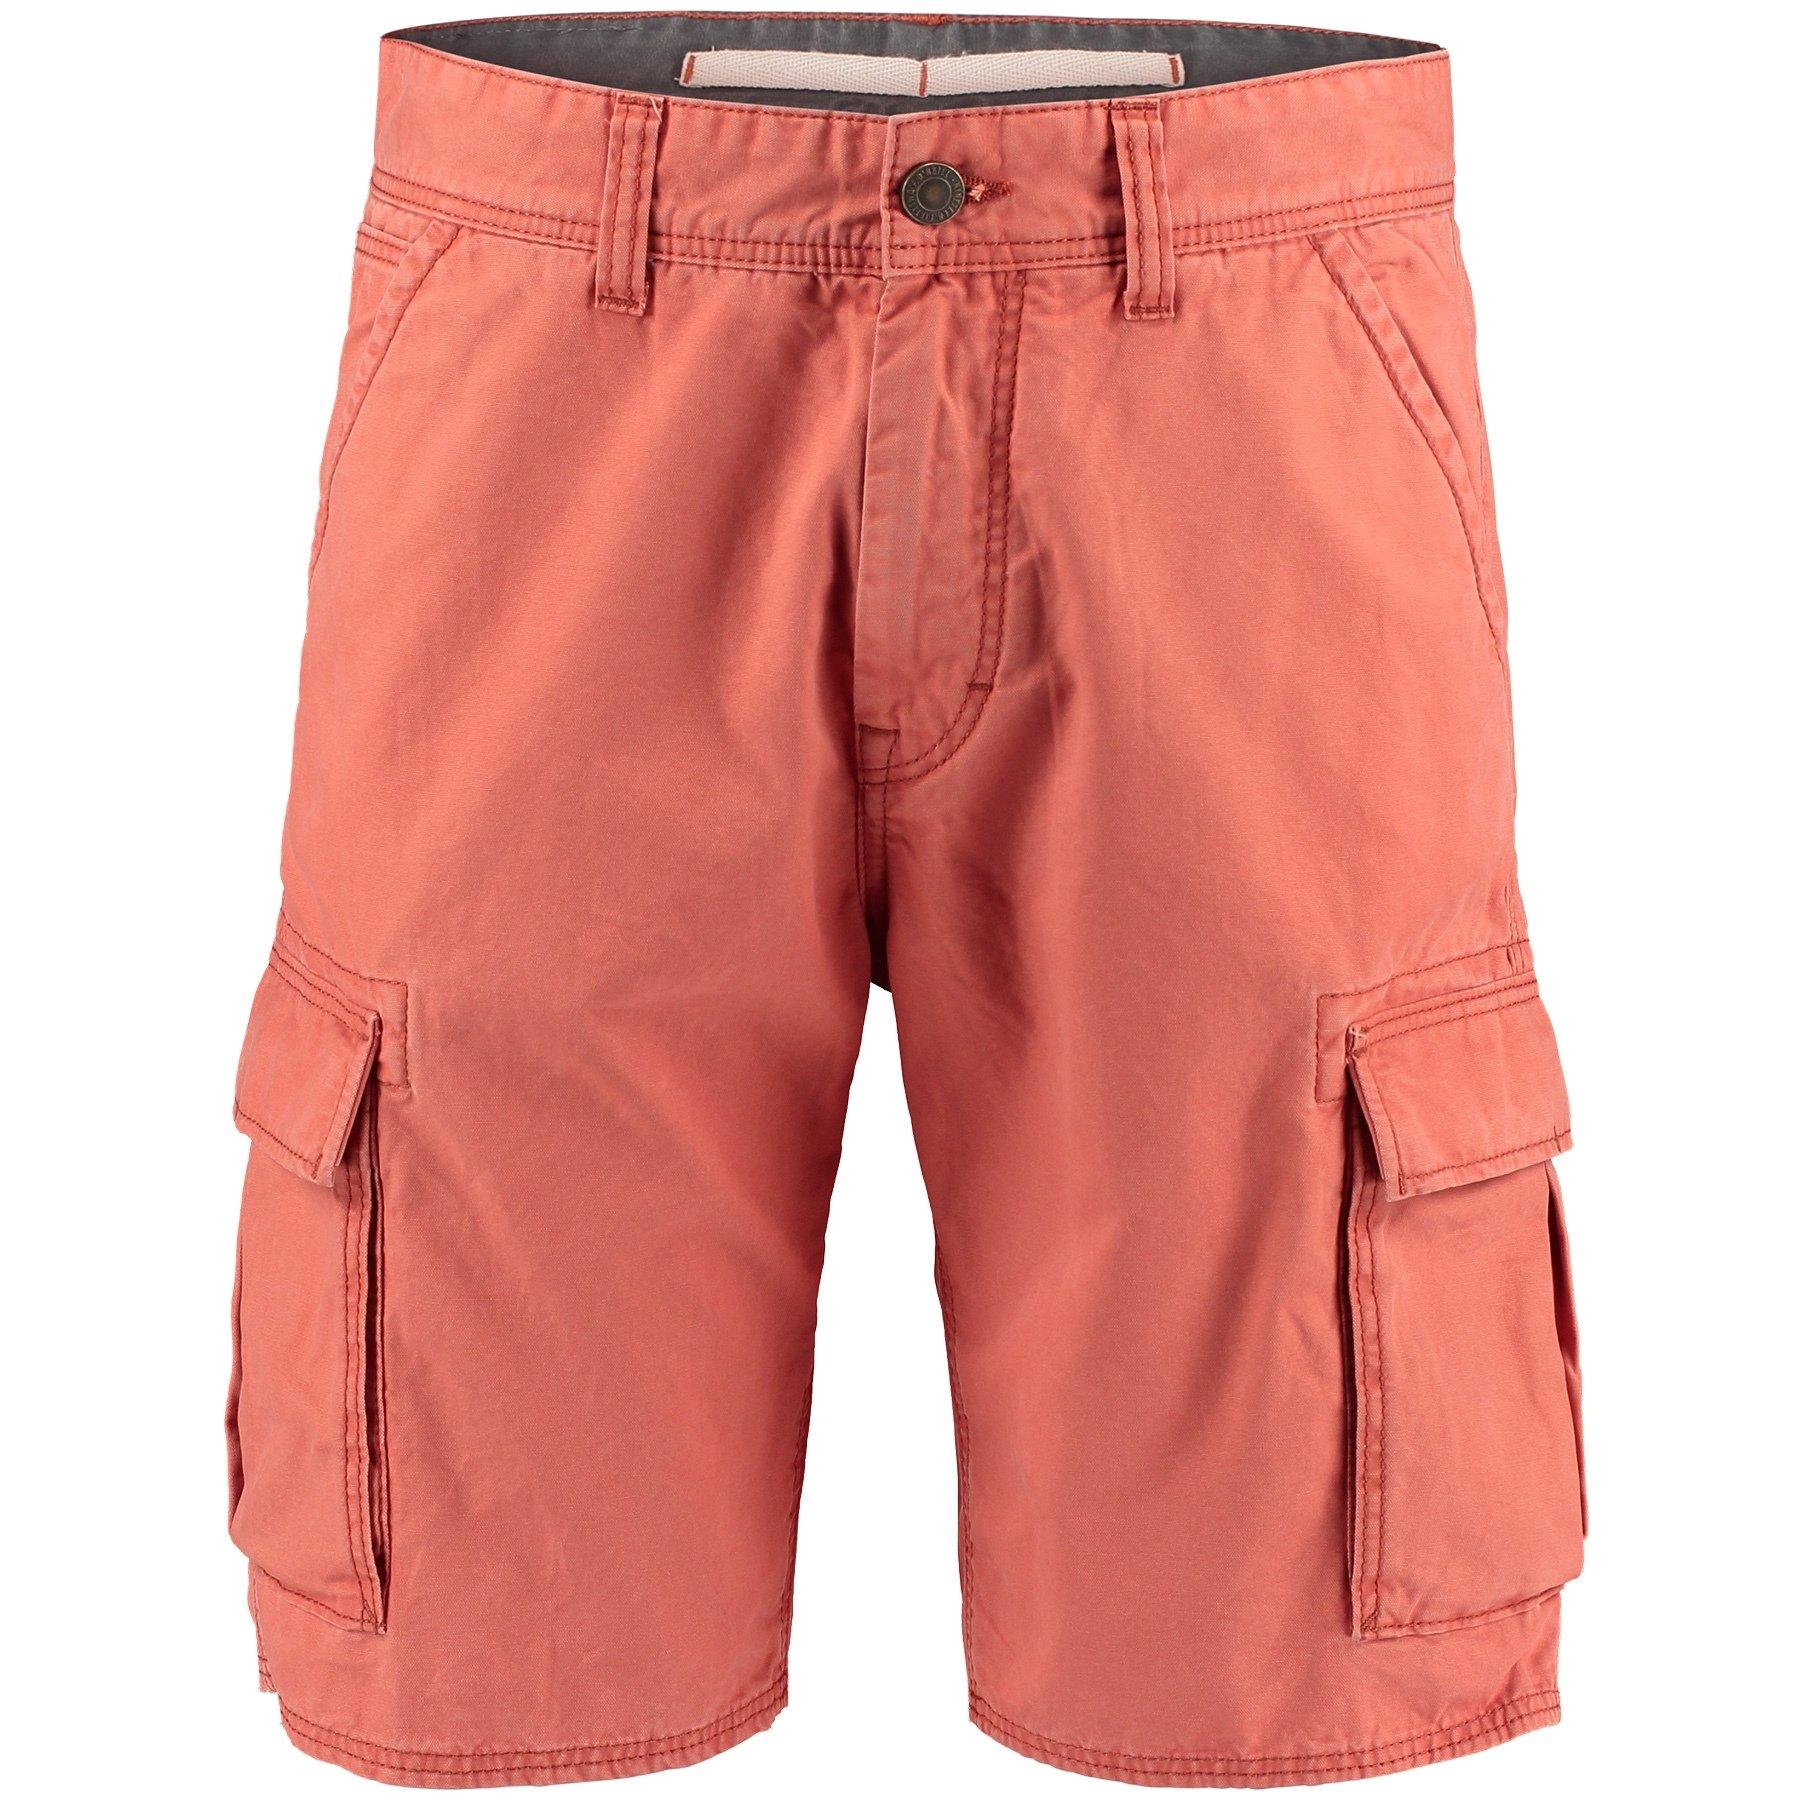 O'neill Shorts »Complex cargo« goedkoop op otto.nl kopen